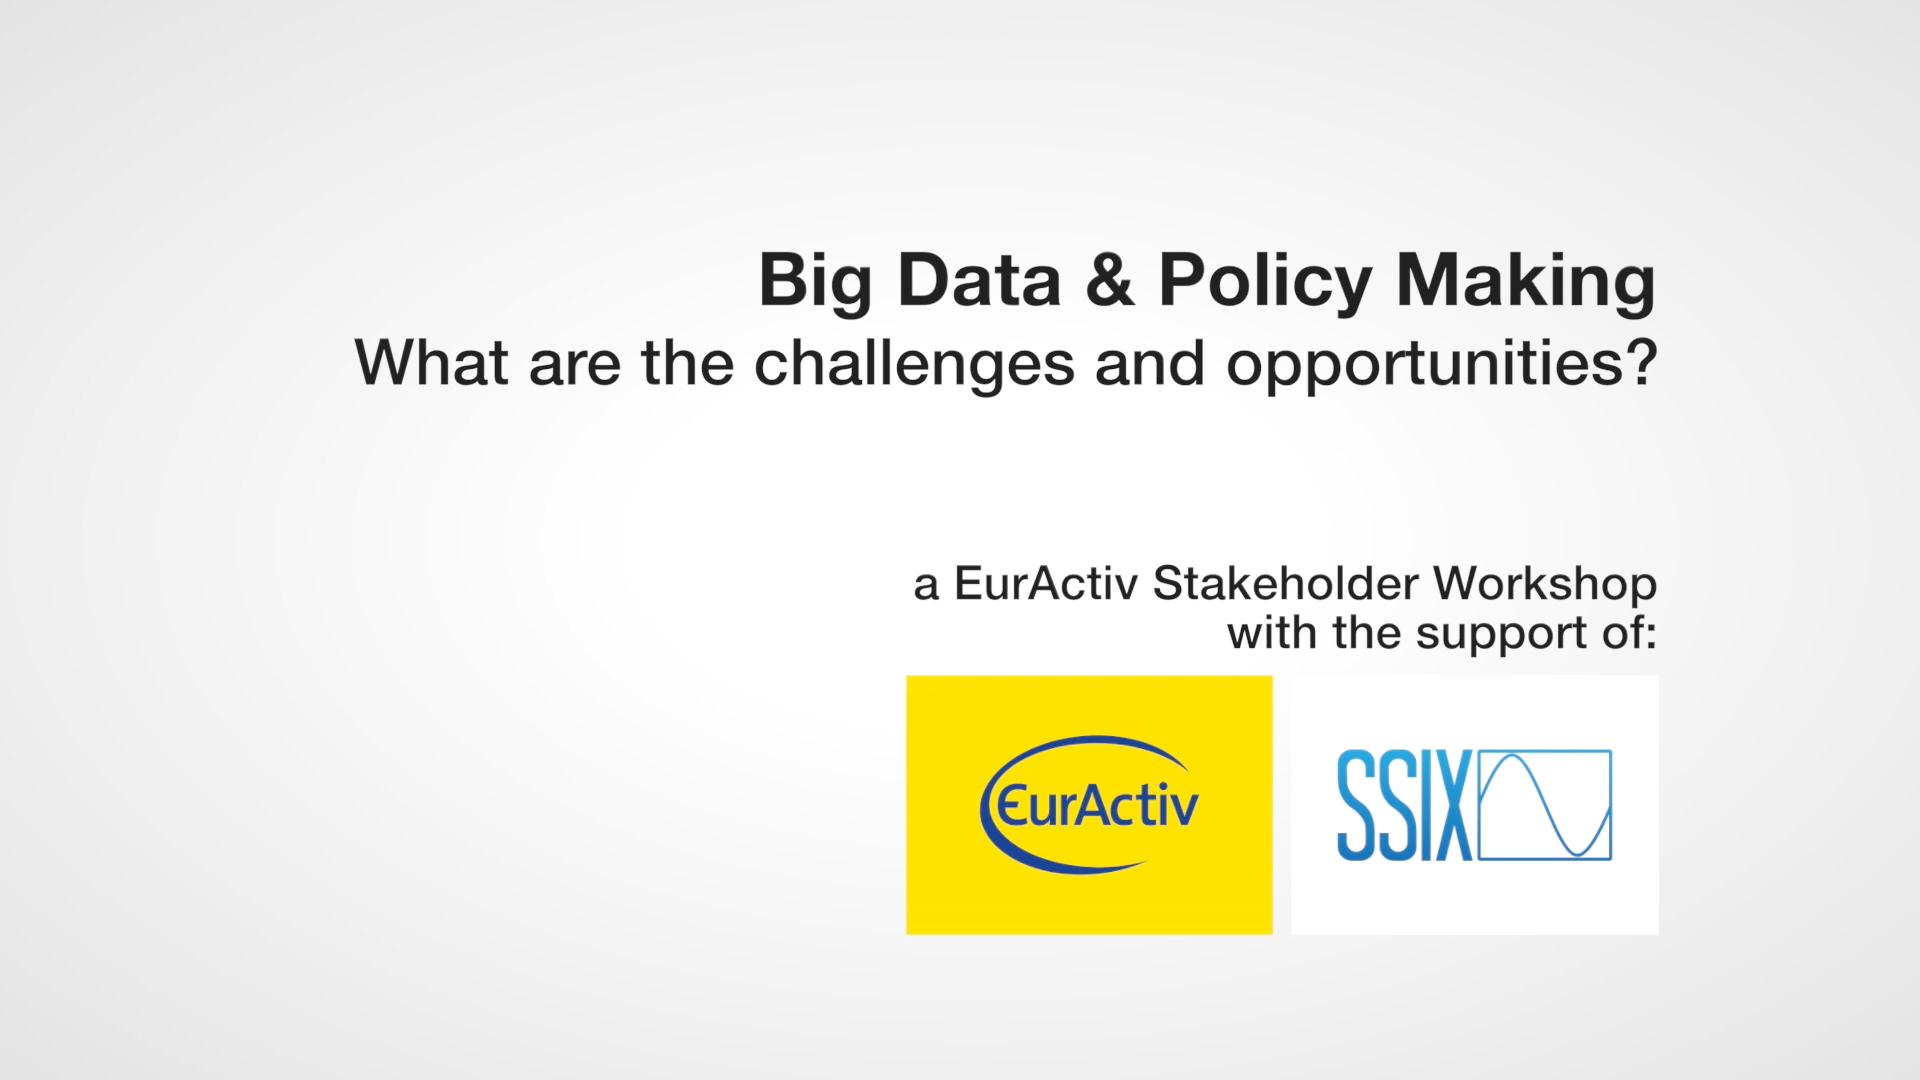 Big Data & Policy Making